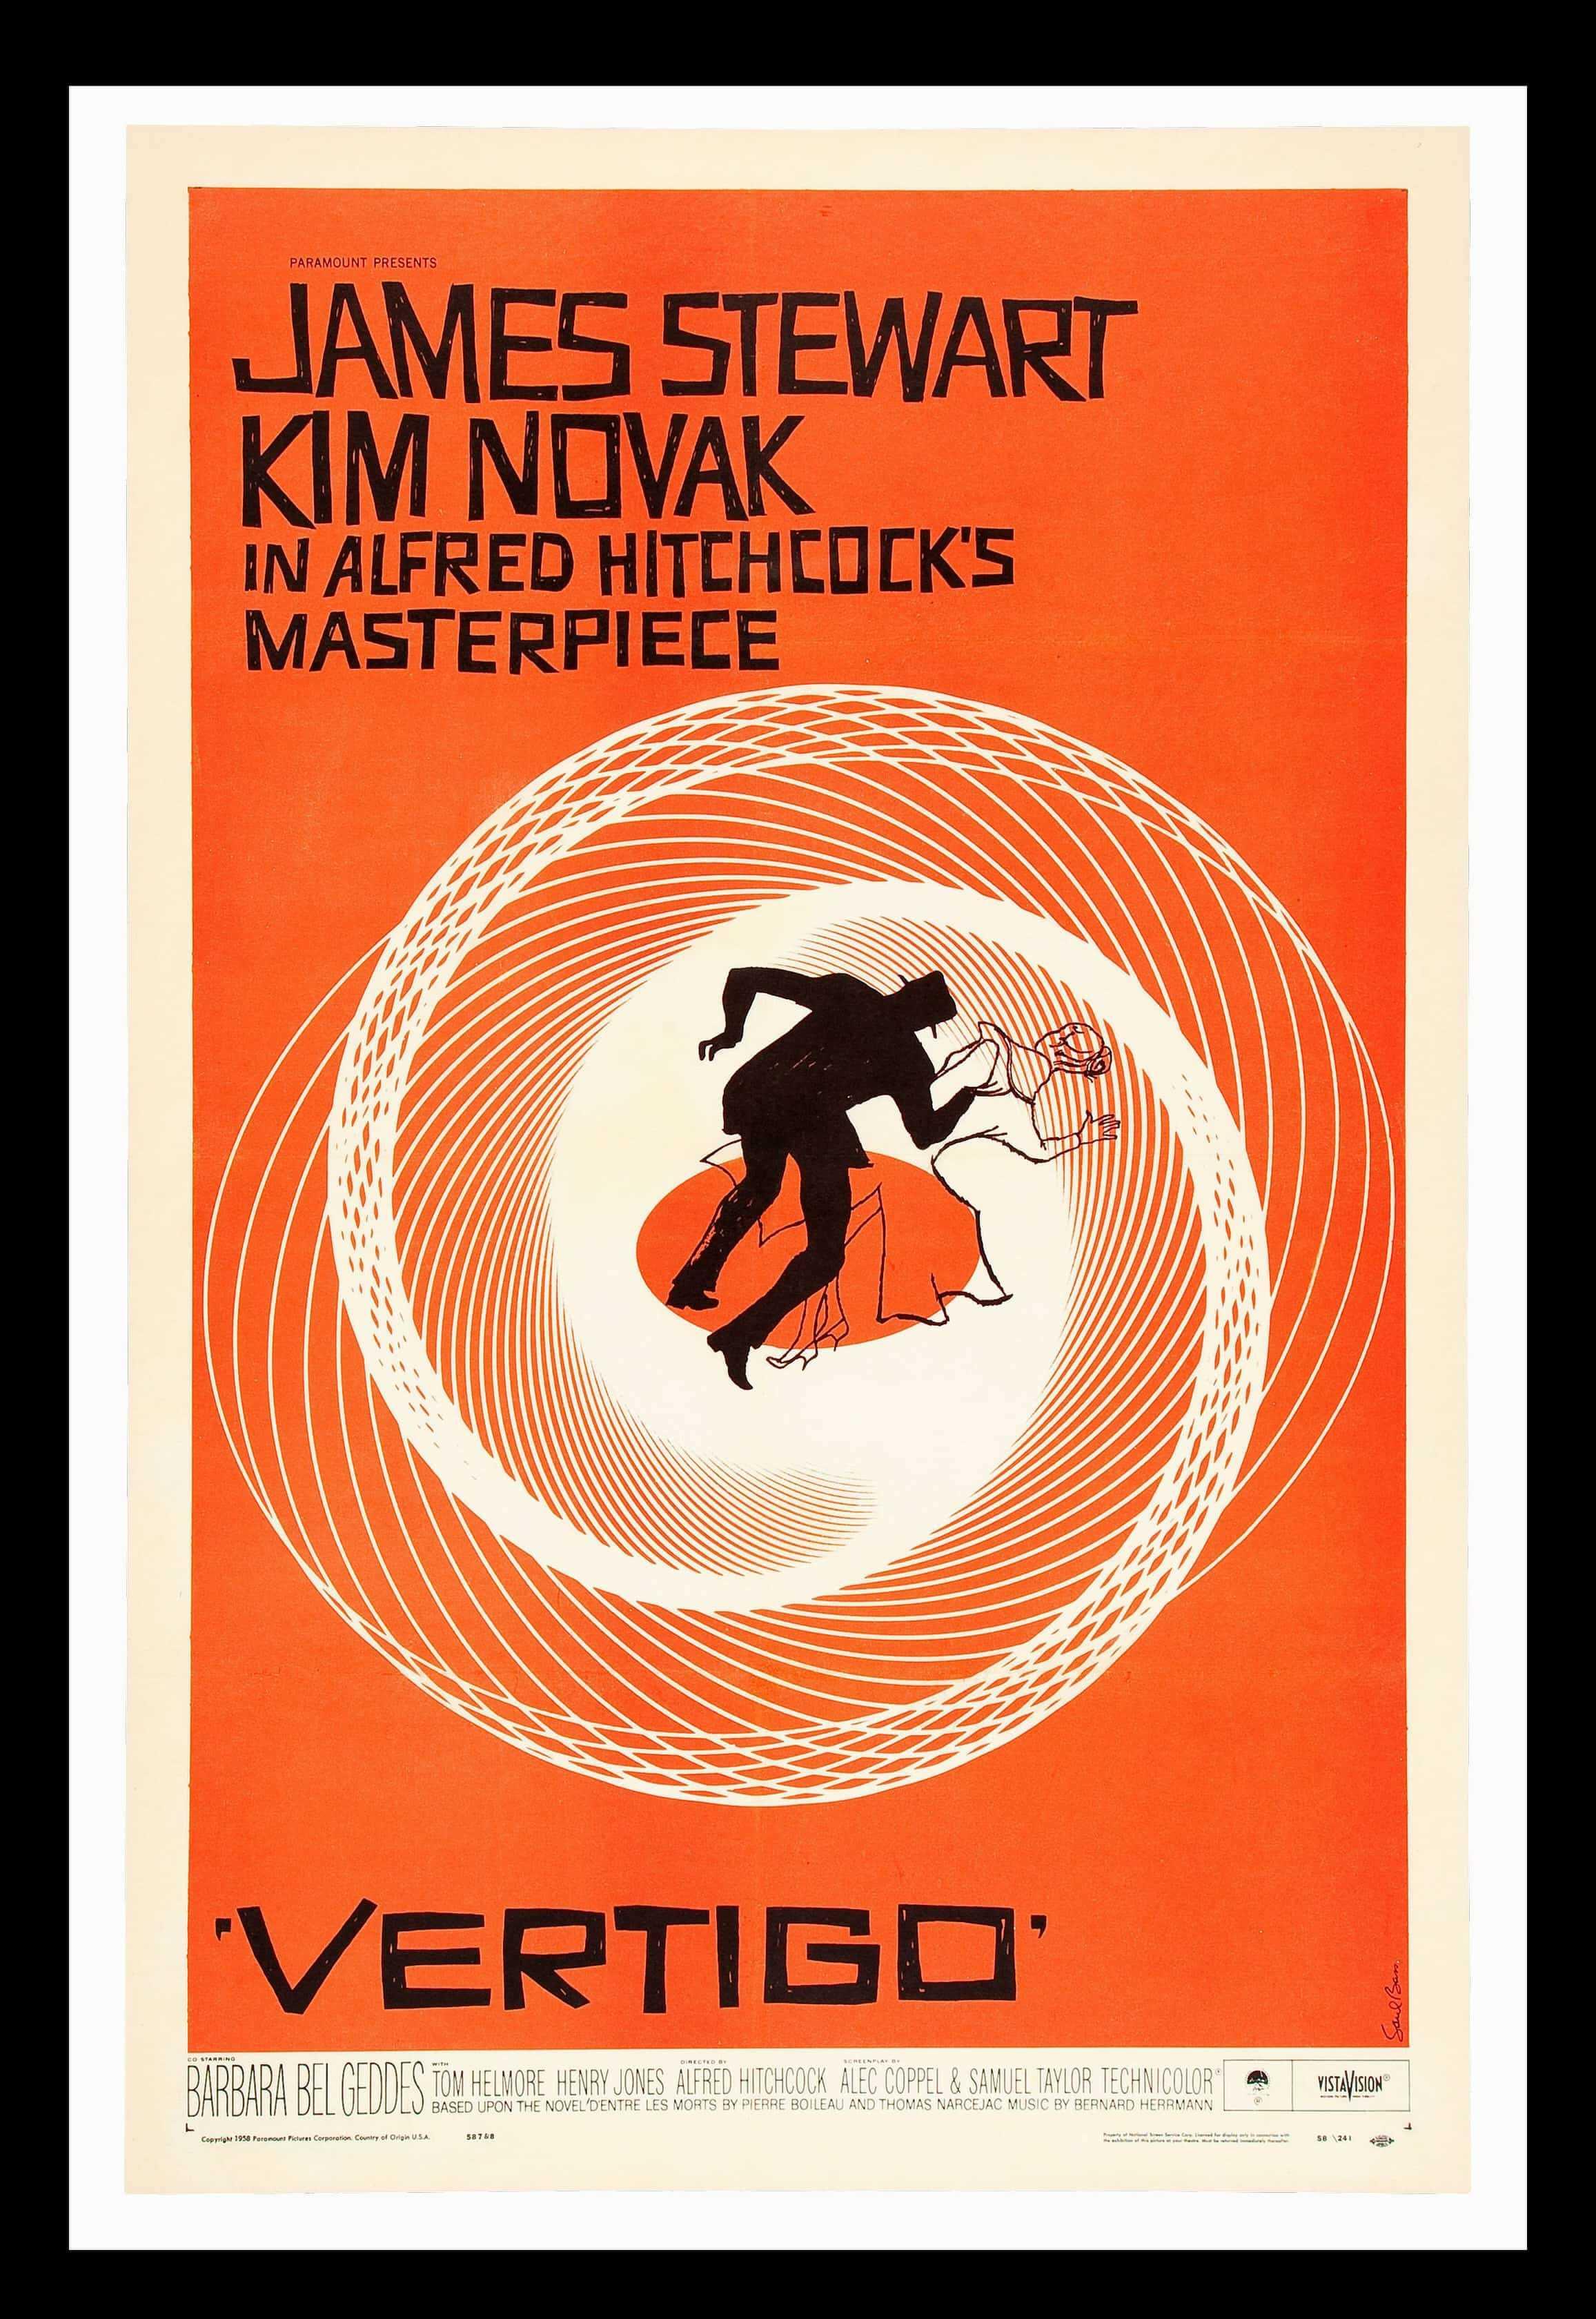 Vertigo-Alfred-Hitchcock-1958.jpg